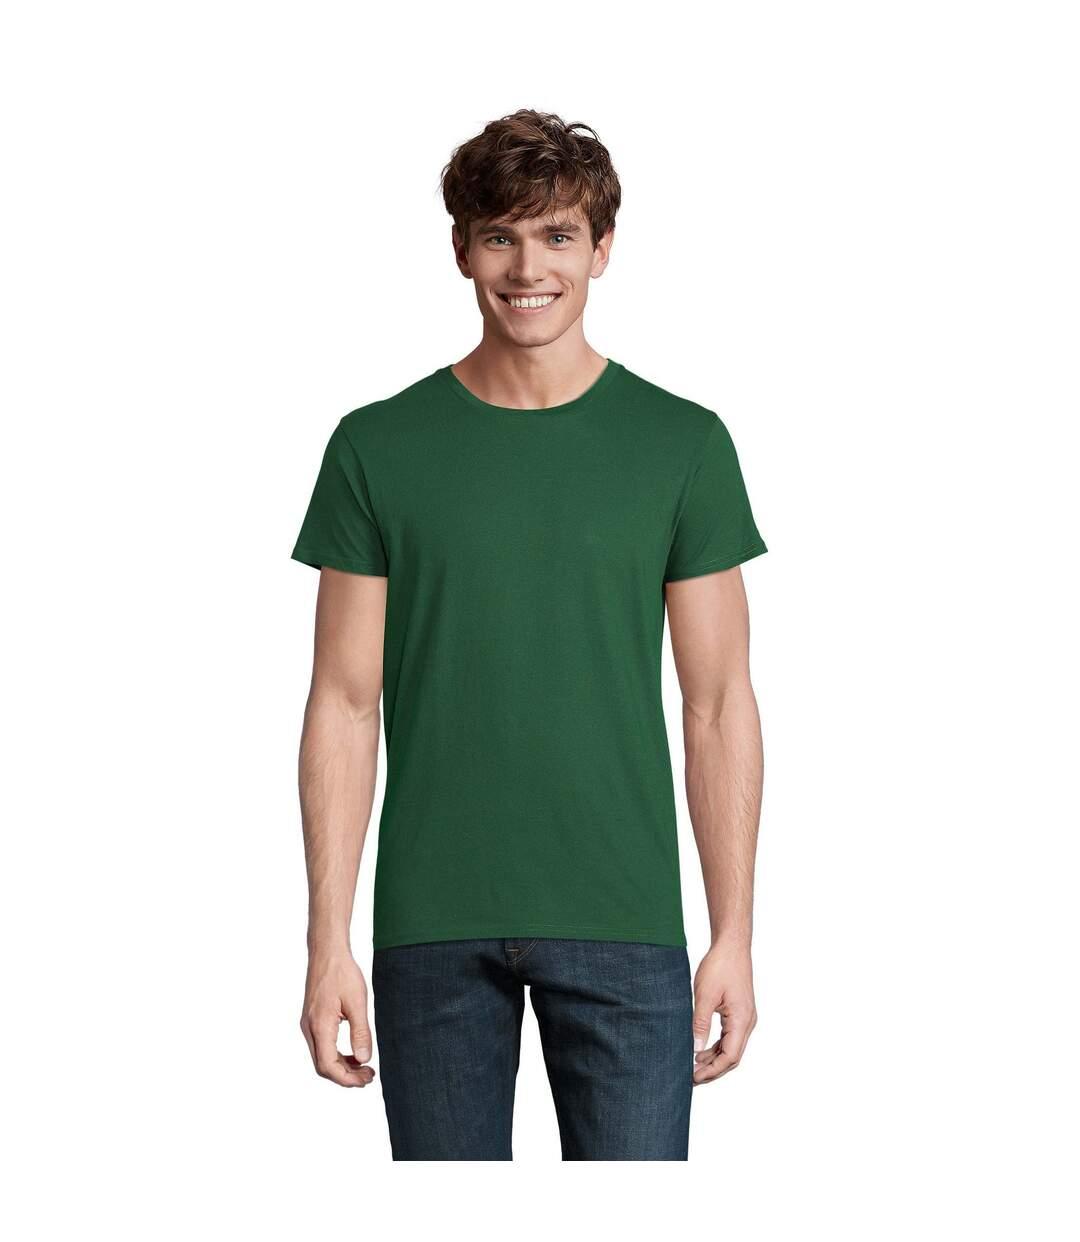 SOLS Mens Crusader Organic T-Shirt (Bottle Green) - UTPC4316